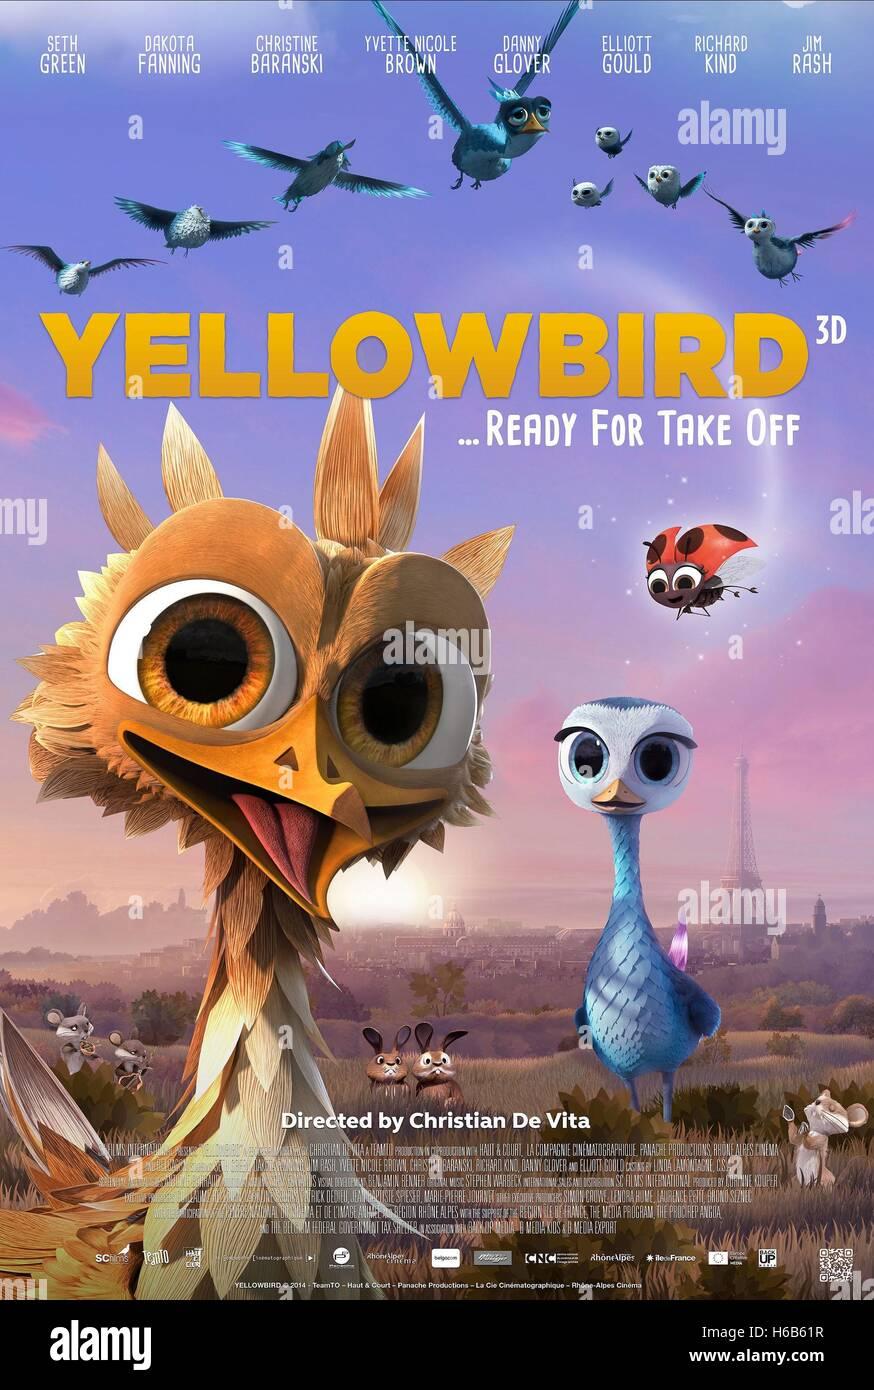 YELLOWBIRD DELF & LADYBUG POSTER YELLOWBIRD (2014) - Stock Image